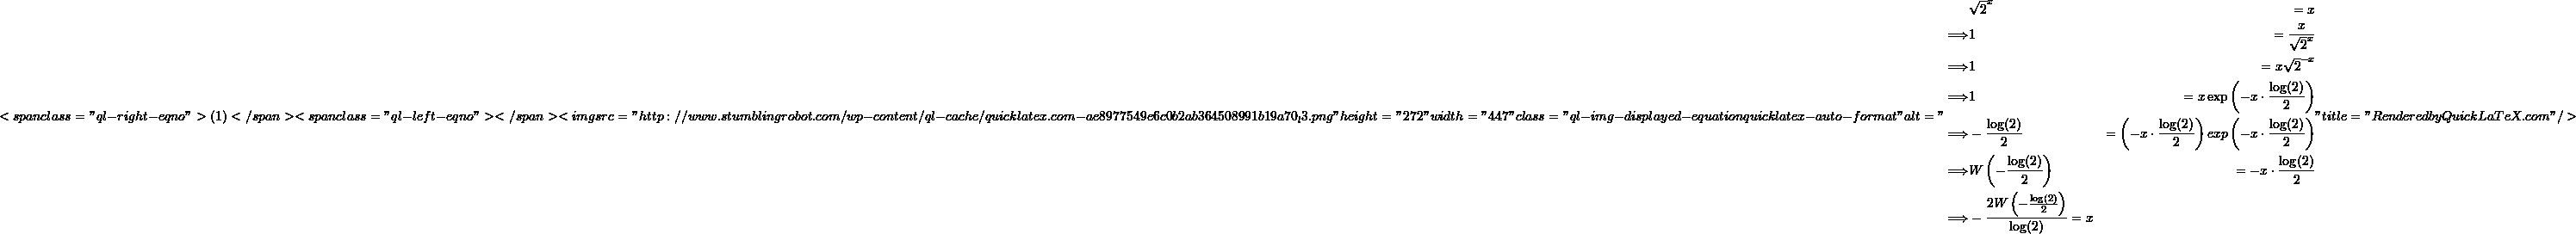 "\[<span class=""ql-right-eqno""> (1) </span><span class=""ql-left-eqno"">   </span><img src=""http://www.stumblingrobot.com/wp-content/ql-cache/quicklatex.com-ae8977549e6c0b2ab364508991b19a70_l3.png"" height=""272"" width=""447"" class=""ql-img-displayed-equation quicklatex-auto-format"" alt=""\begin{align*} &\sqrt{2}^x &= x \\ \Longrightarrow &1 &= \frac{x}{\sqrt{2}^x} \\ \Longrightarrow &1 &= x\sqrt{2}^{-x} \\ \Longrightarrow &1 &= x\exp\left(-x \cdot \frac{\log(2)}{2}\right) \\ \Longrightarrow &-\frac{\log(2)}{2} &= \left(-x \cdot \frac{\log(2)}{2}\right) exp\left(-x \cdot \frac{\log(2)}{2}\right) \\ \Longrightarrow & W\left(-\frac{\log(2)}{2}\right) &= -x \cdot \frac{\log(2)}{2} \\ \Longrightarrow & -\frac{2W\left(-\frac{\log(2)}{2}\right)}{\log(2)} = x \end{align*}"" title=""Rendered by QuickLaTeX.com""/>\]"